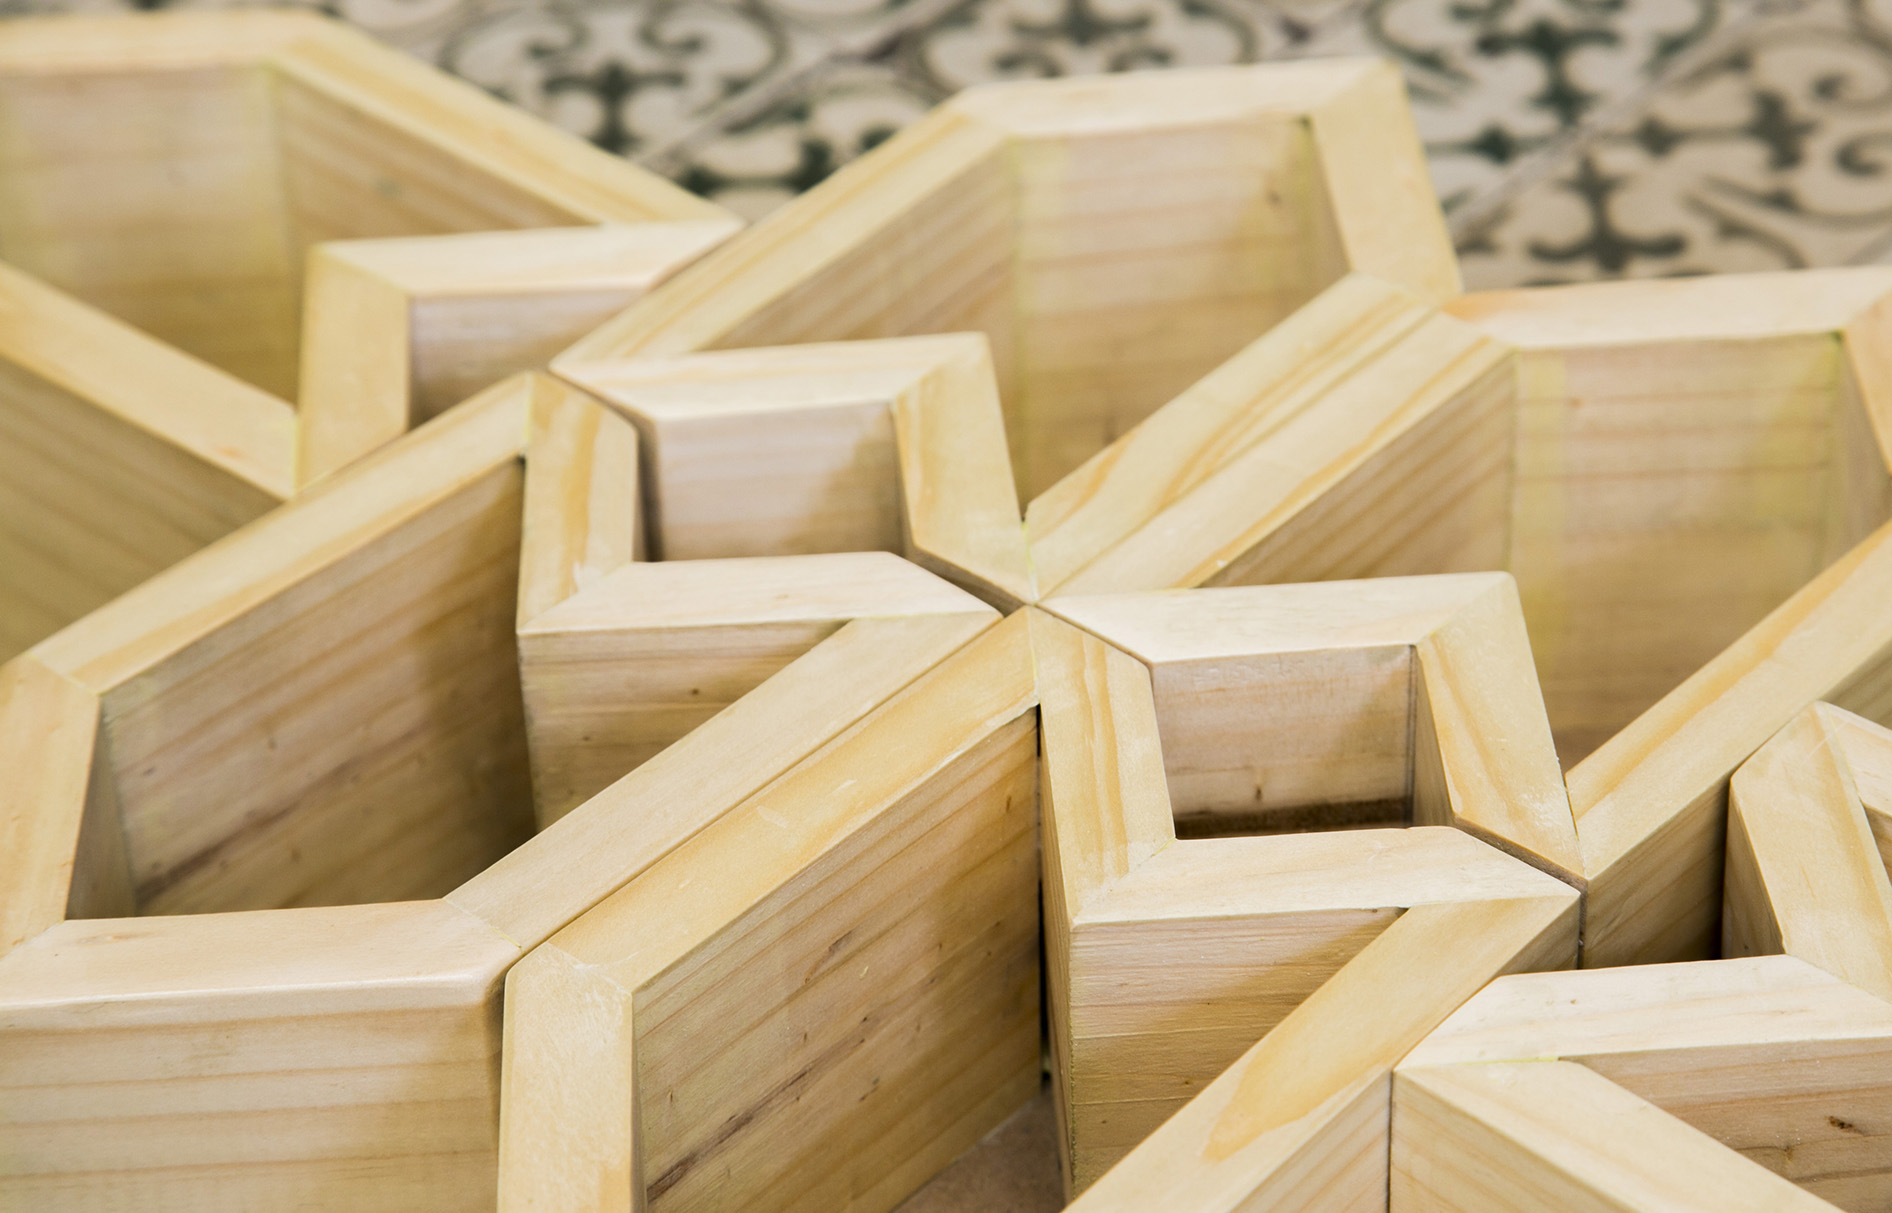 Maceteros de madera originales stunning madera para - Maceteros de madera ...